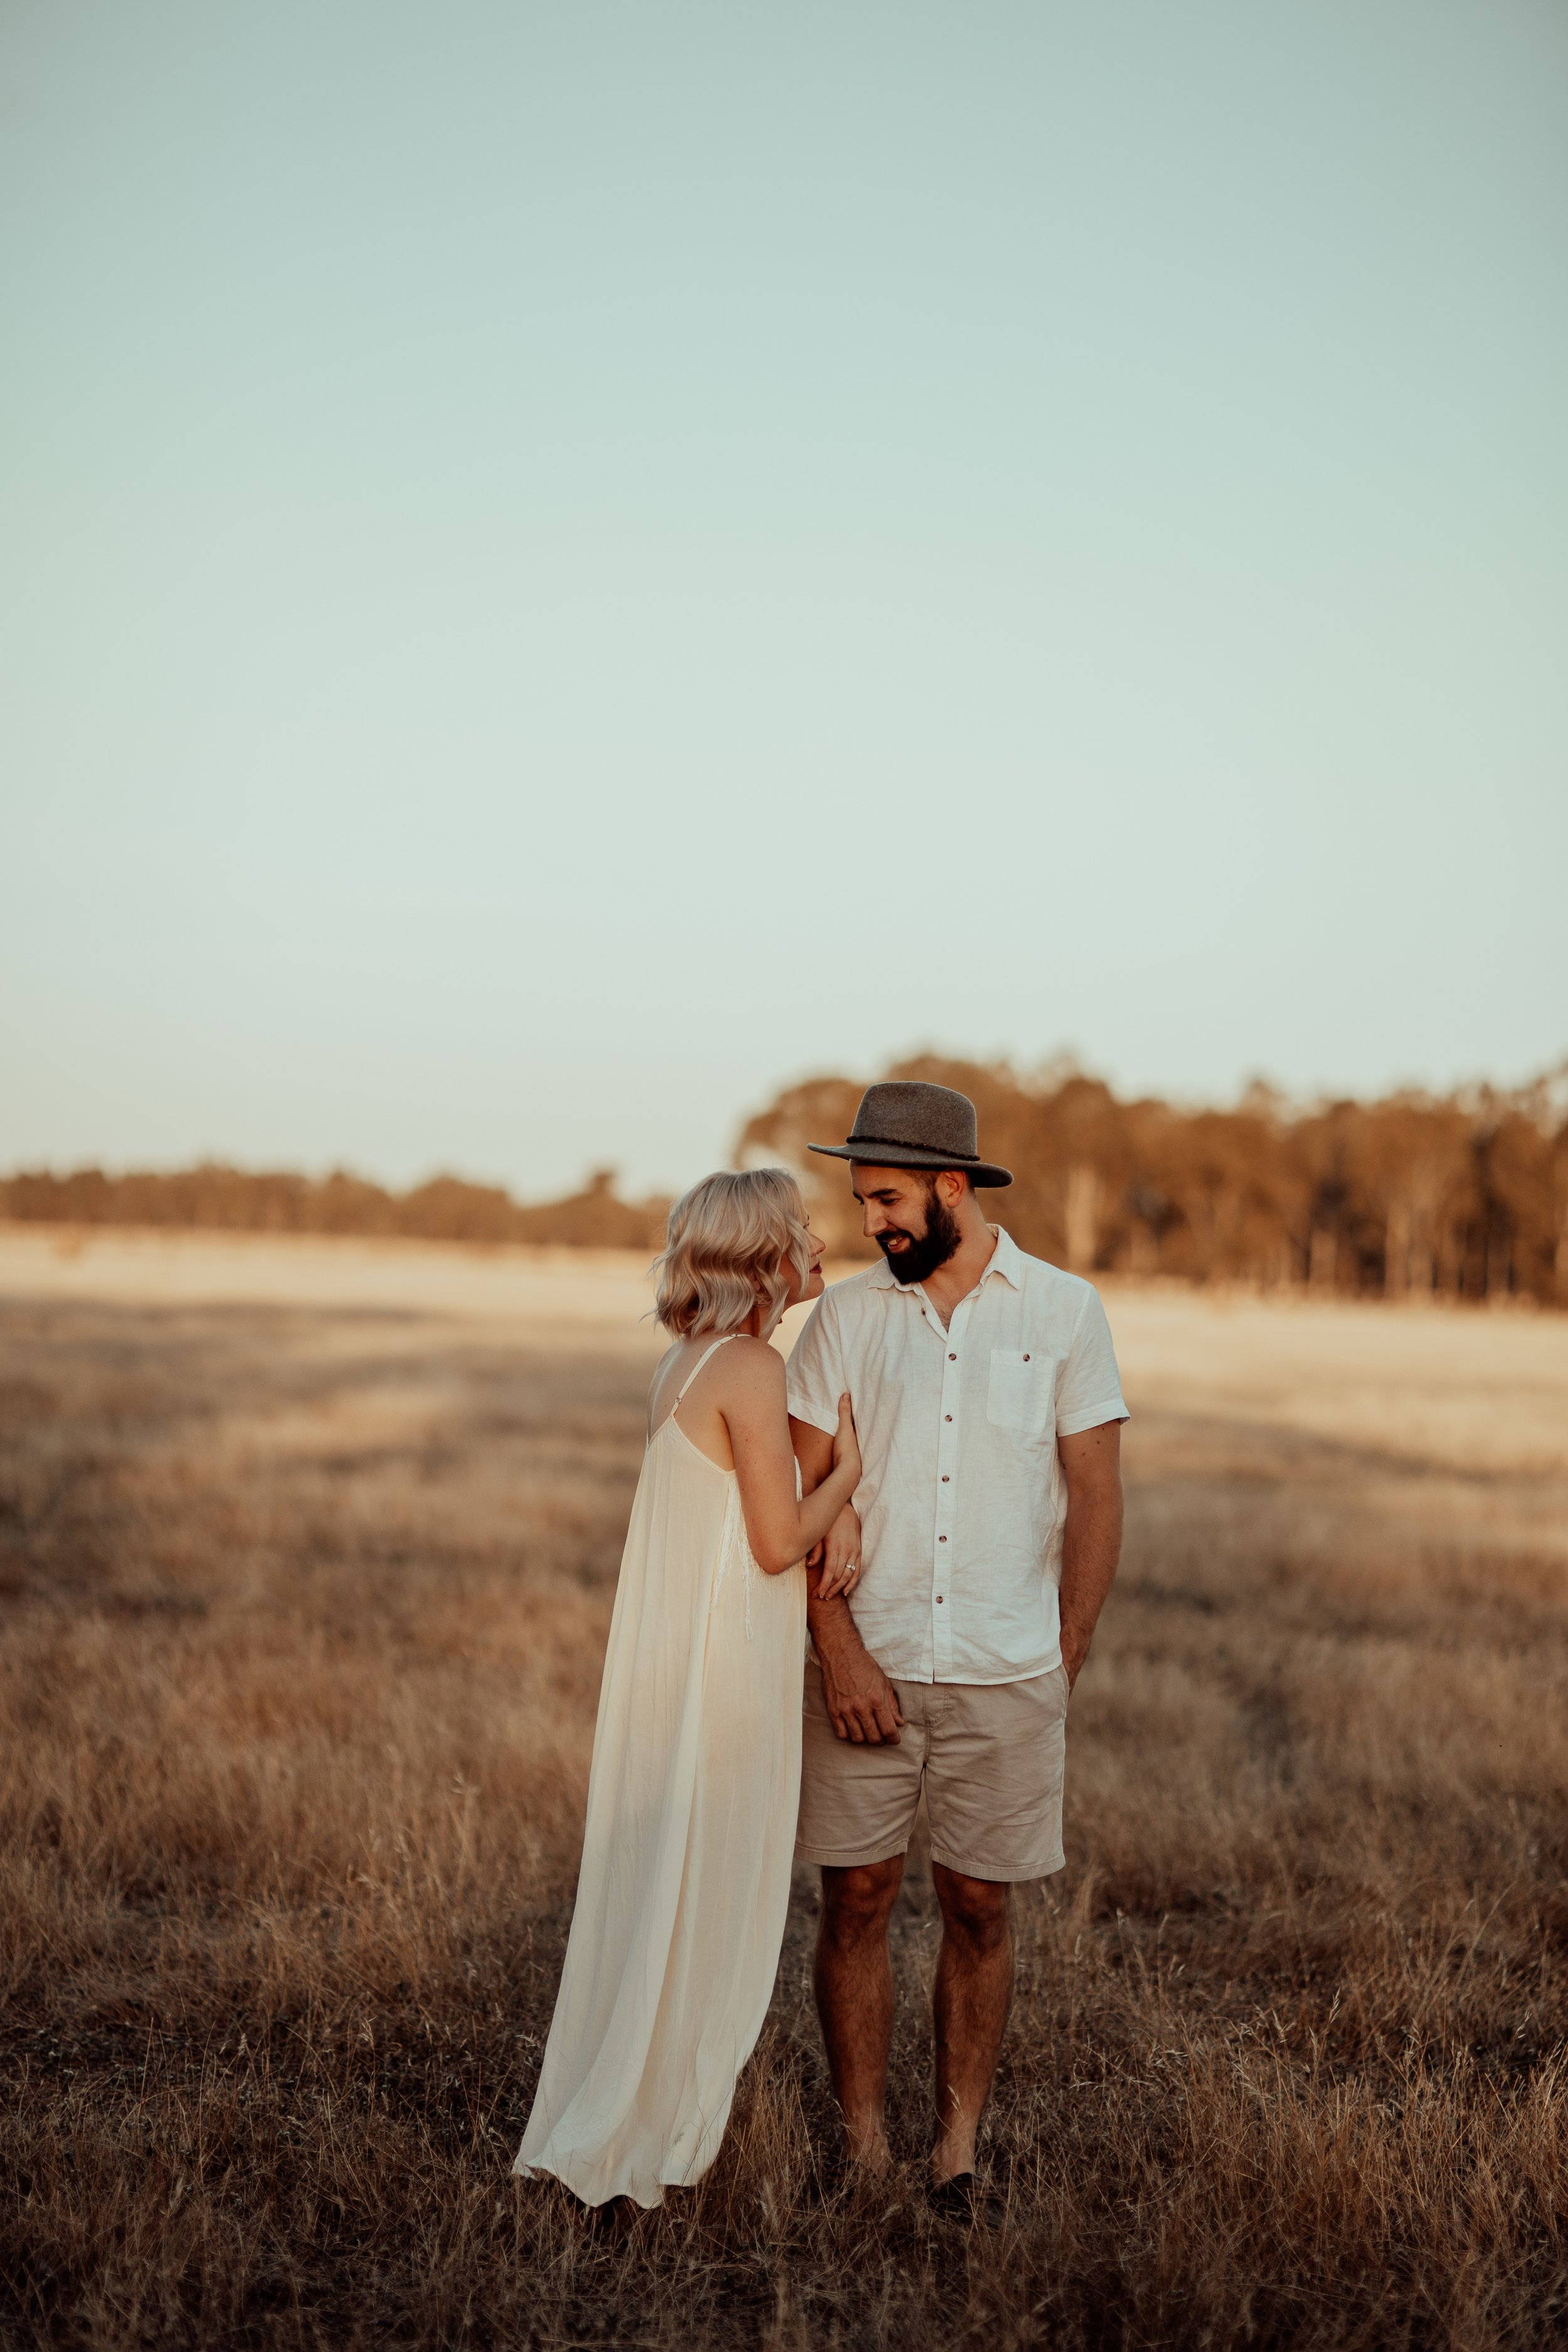 mickalathomas_puremacphotography_weddingphotographer_couplephotographer_Sheppartonphotographer_1634.jpg